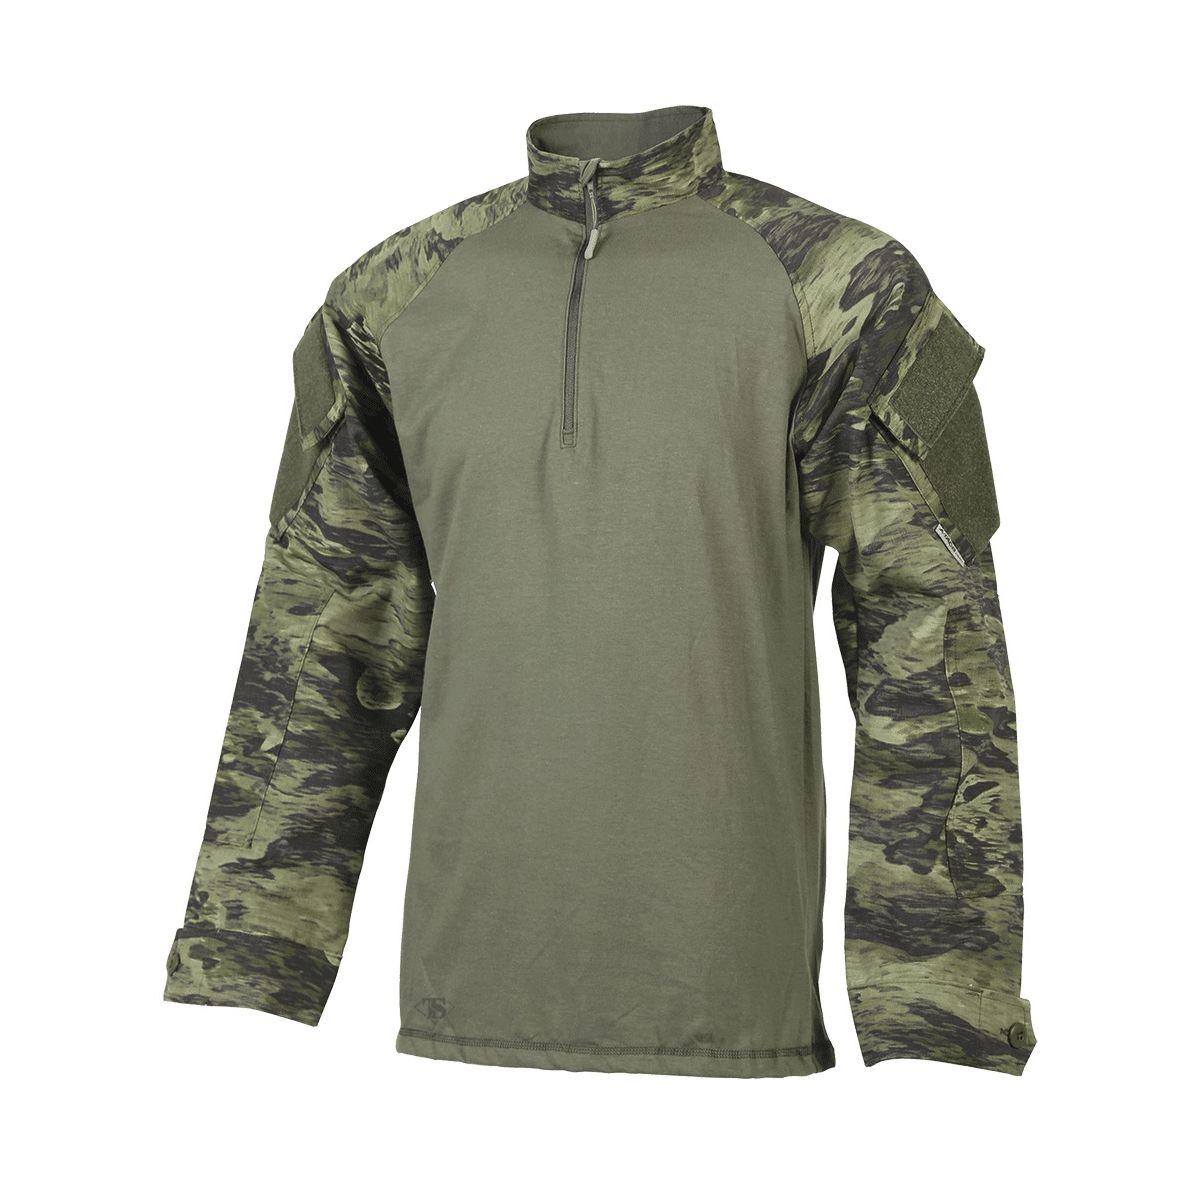 Košile taktická BDU Xtreme 1/4 zip A-TACS FG-X - zvìtšit obrázek